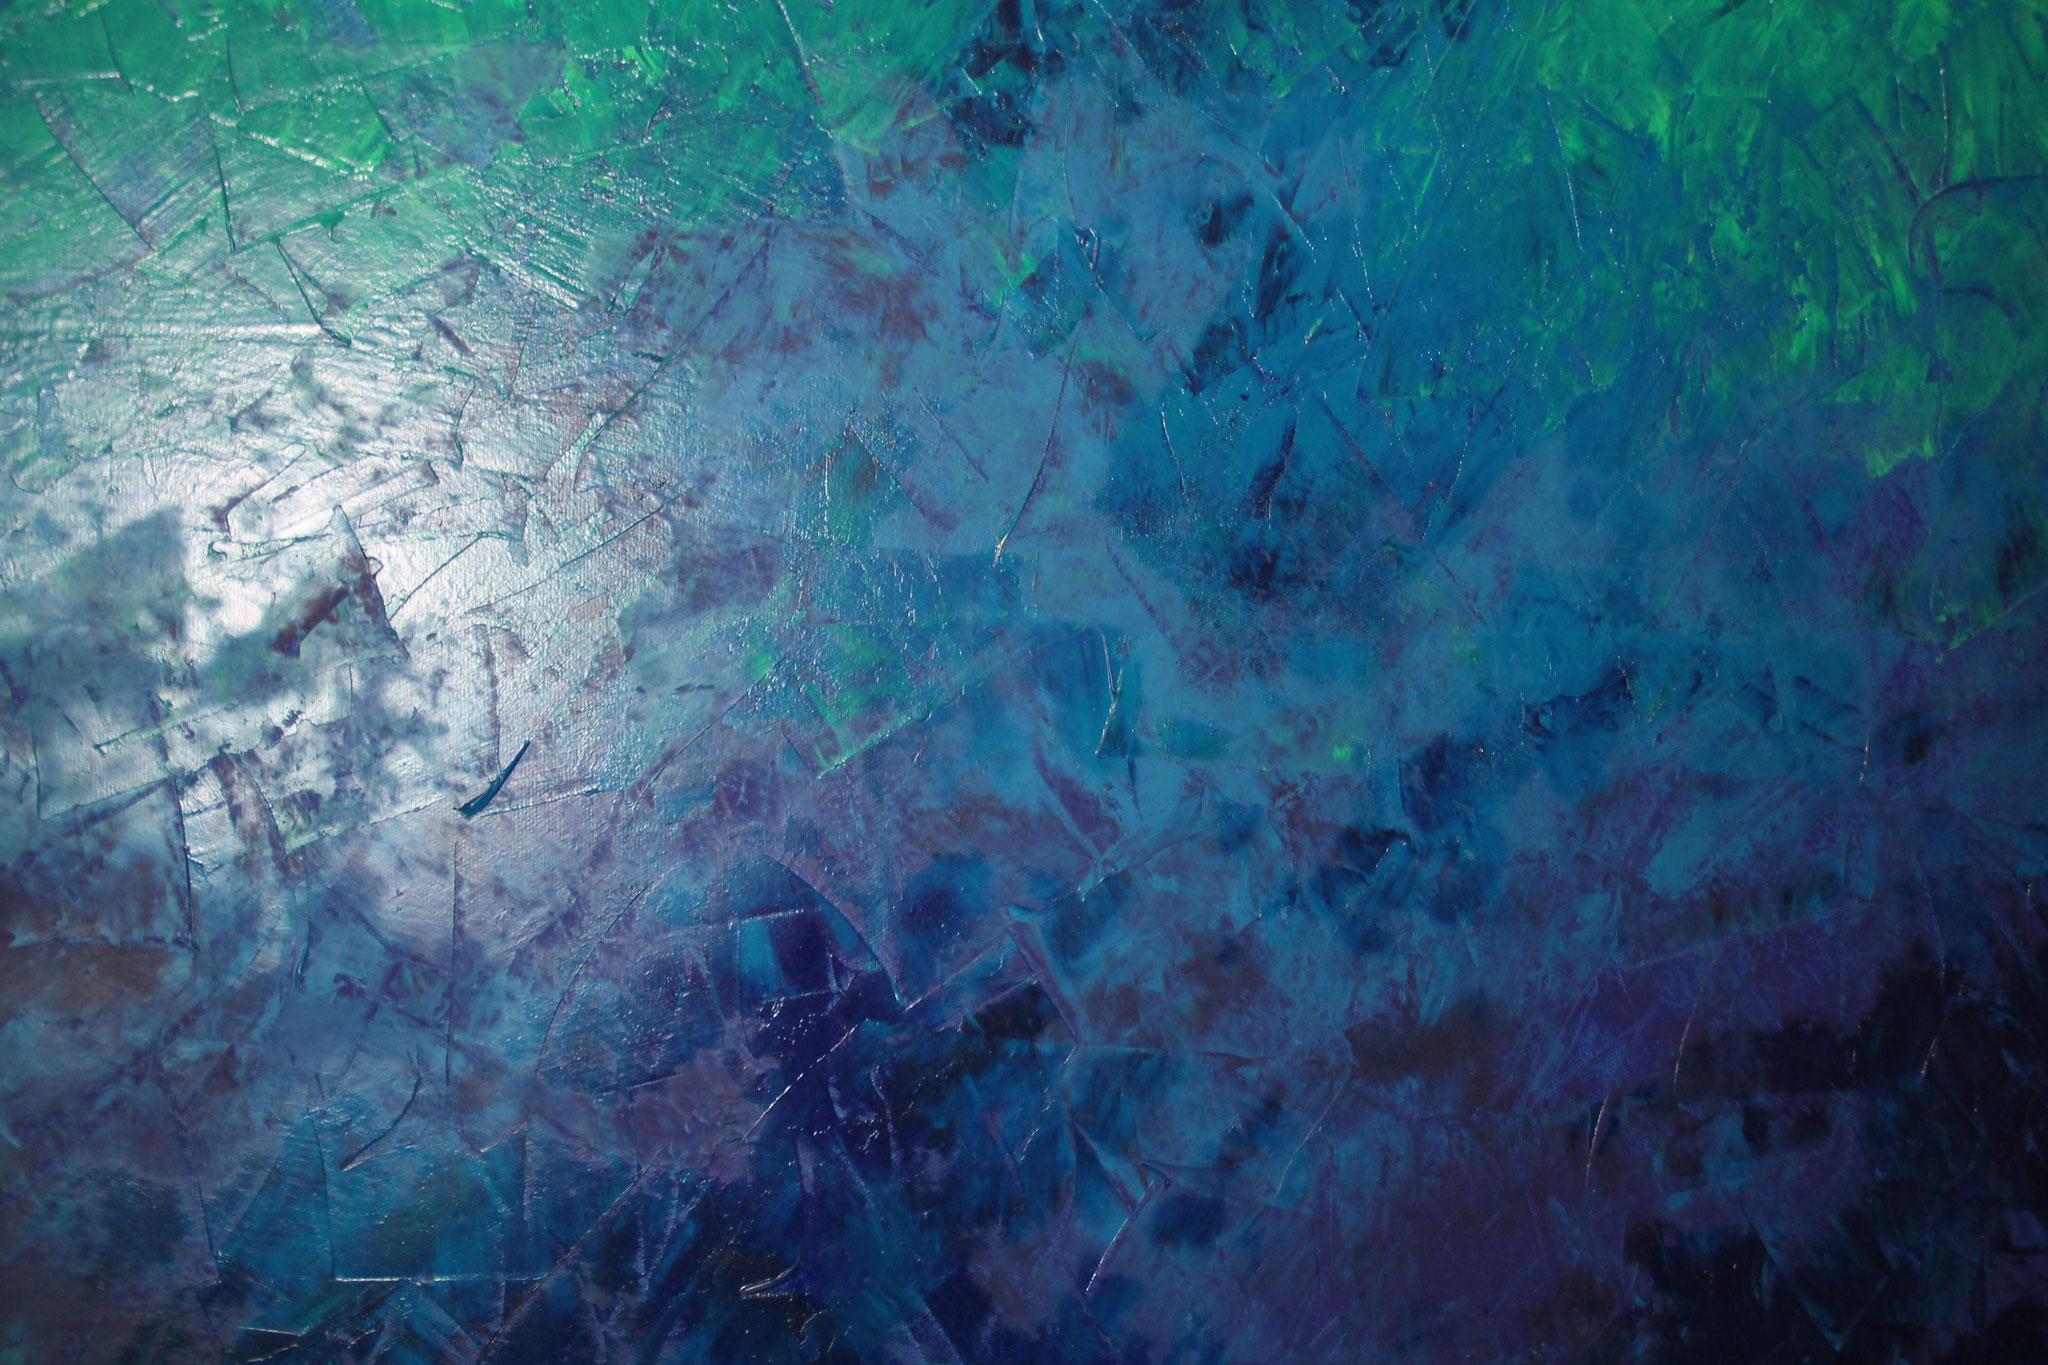 Tiefsee, Öl auf Leinwand, 2016